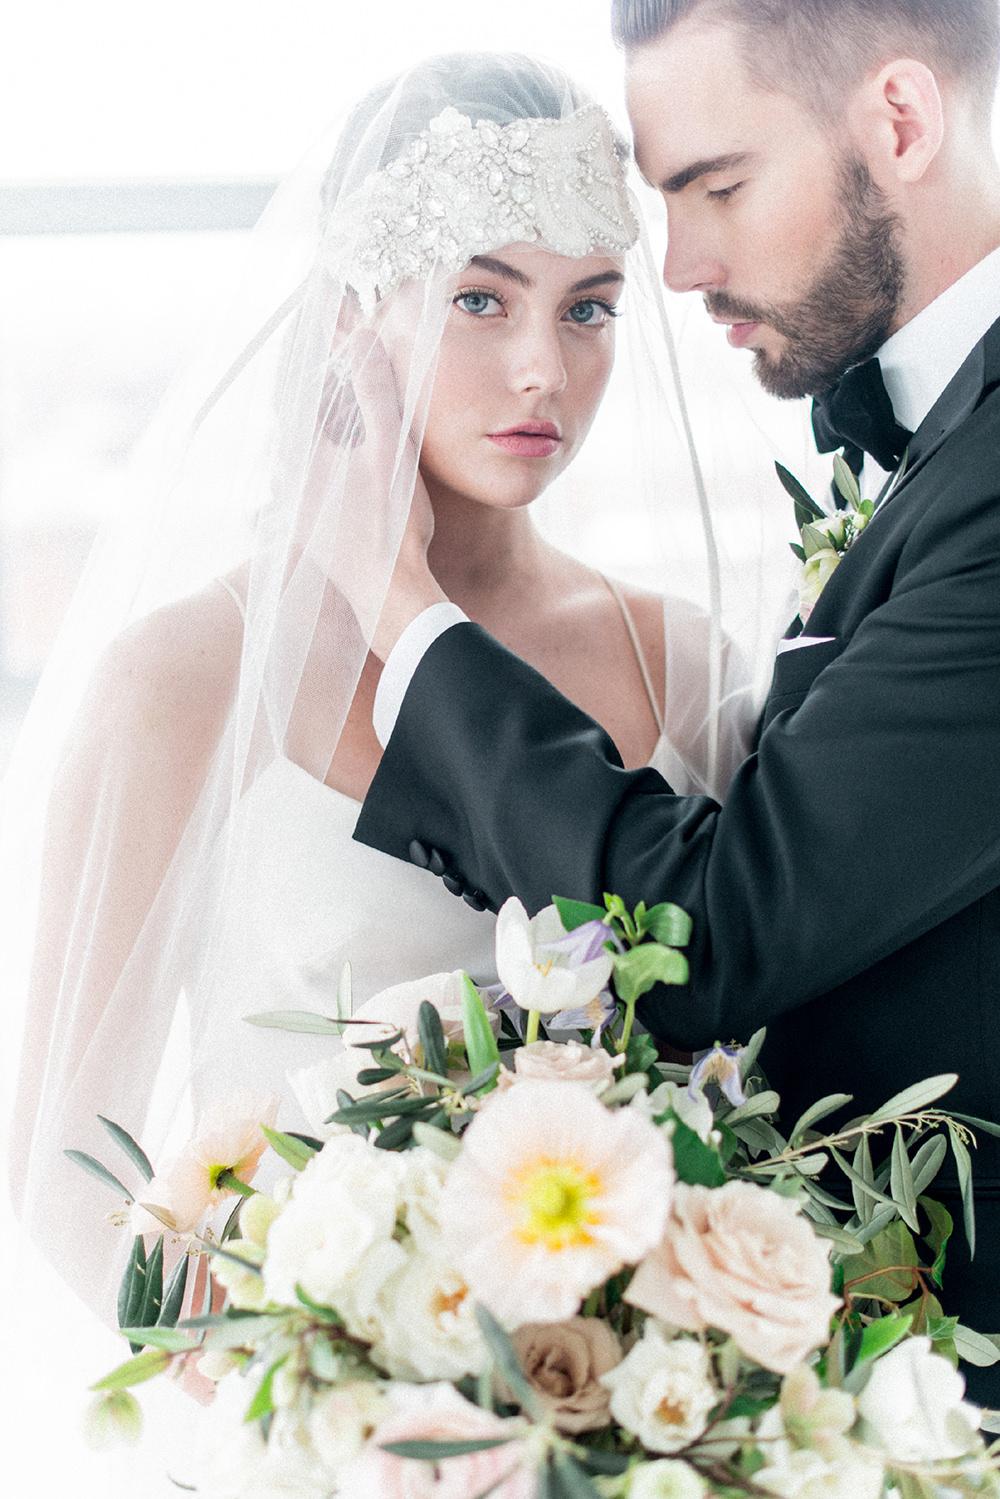 wedding ceremonies - photo by Laura Kelly Photography http://ruffledblog.com/minimalist-monochrome-european-wedding-inspiration